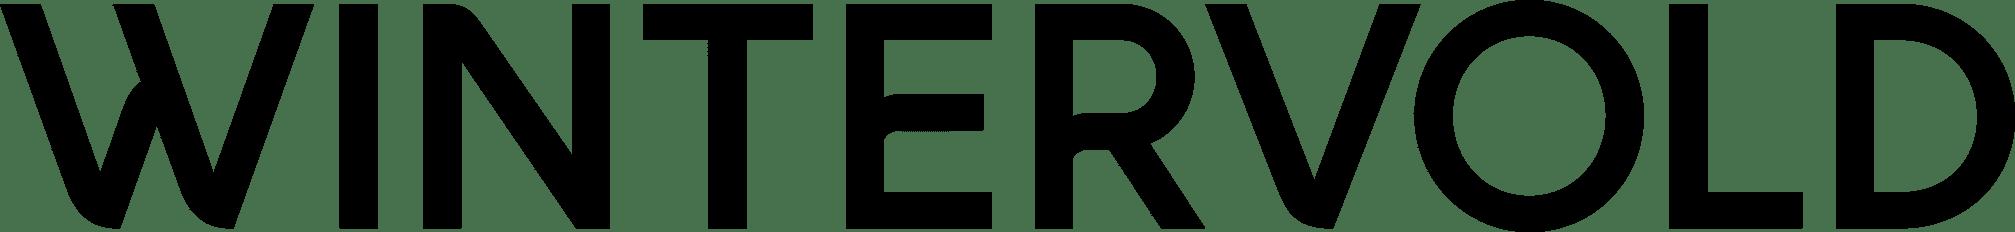 Clip art, Line, Logo, Text, Font